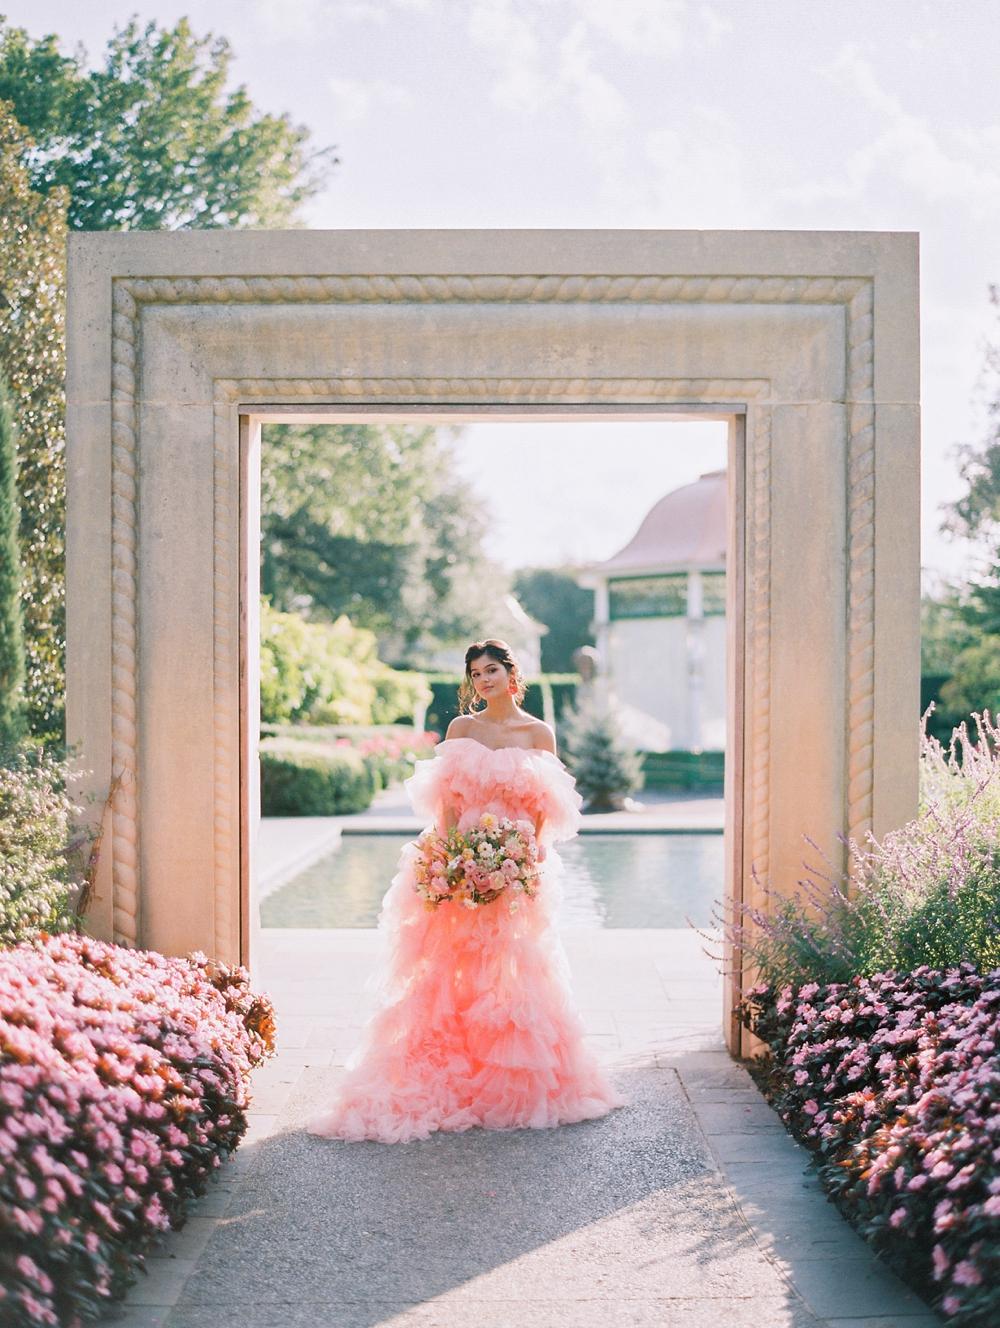 kristin-la-voie-photography-DALLAS-WEDDING-BRIDAL-PHOTOGRAPHER-BOTANICAL-ARBORETUM-102